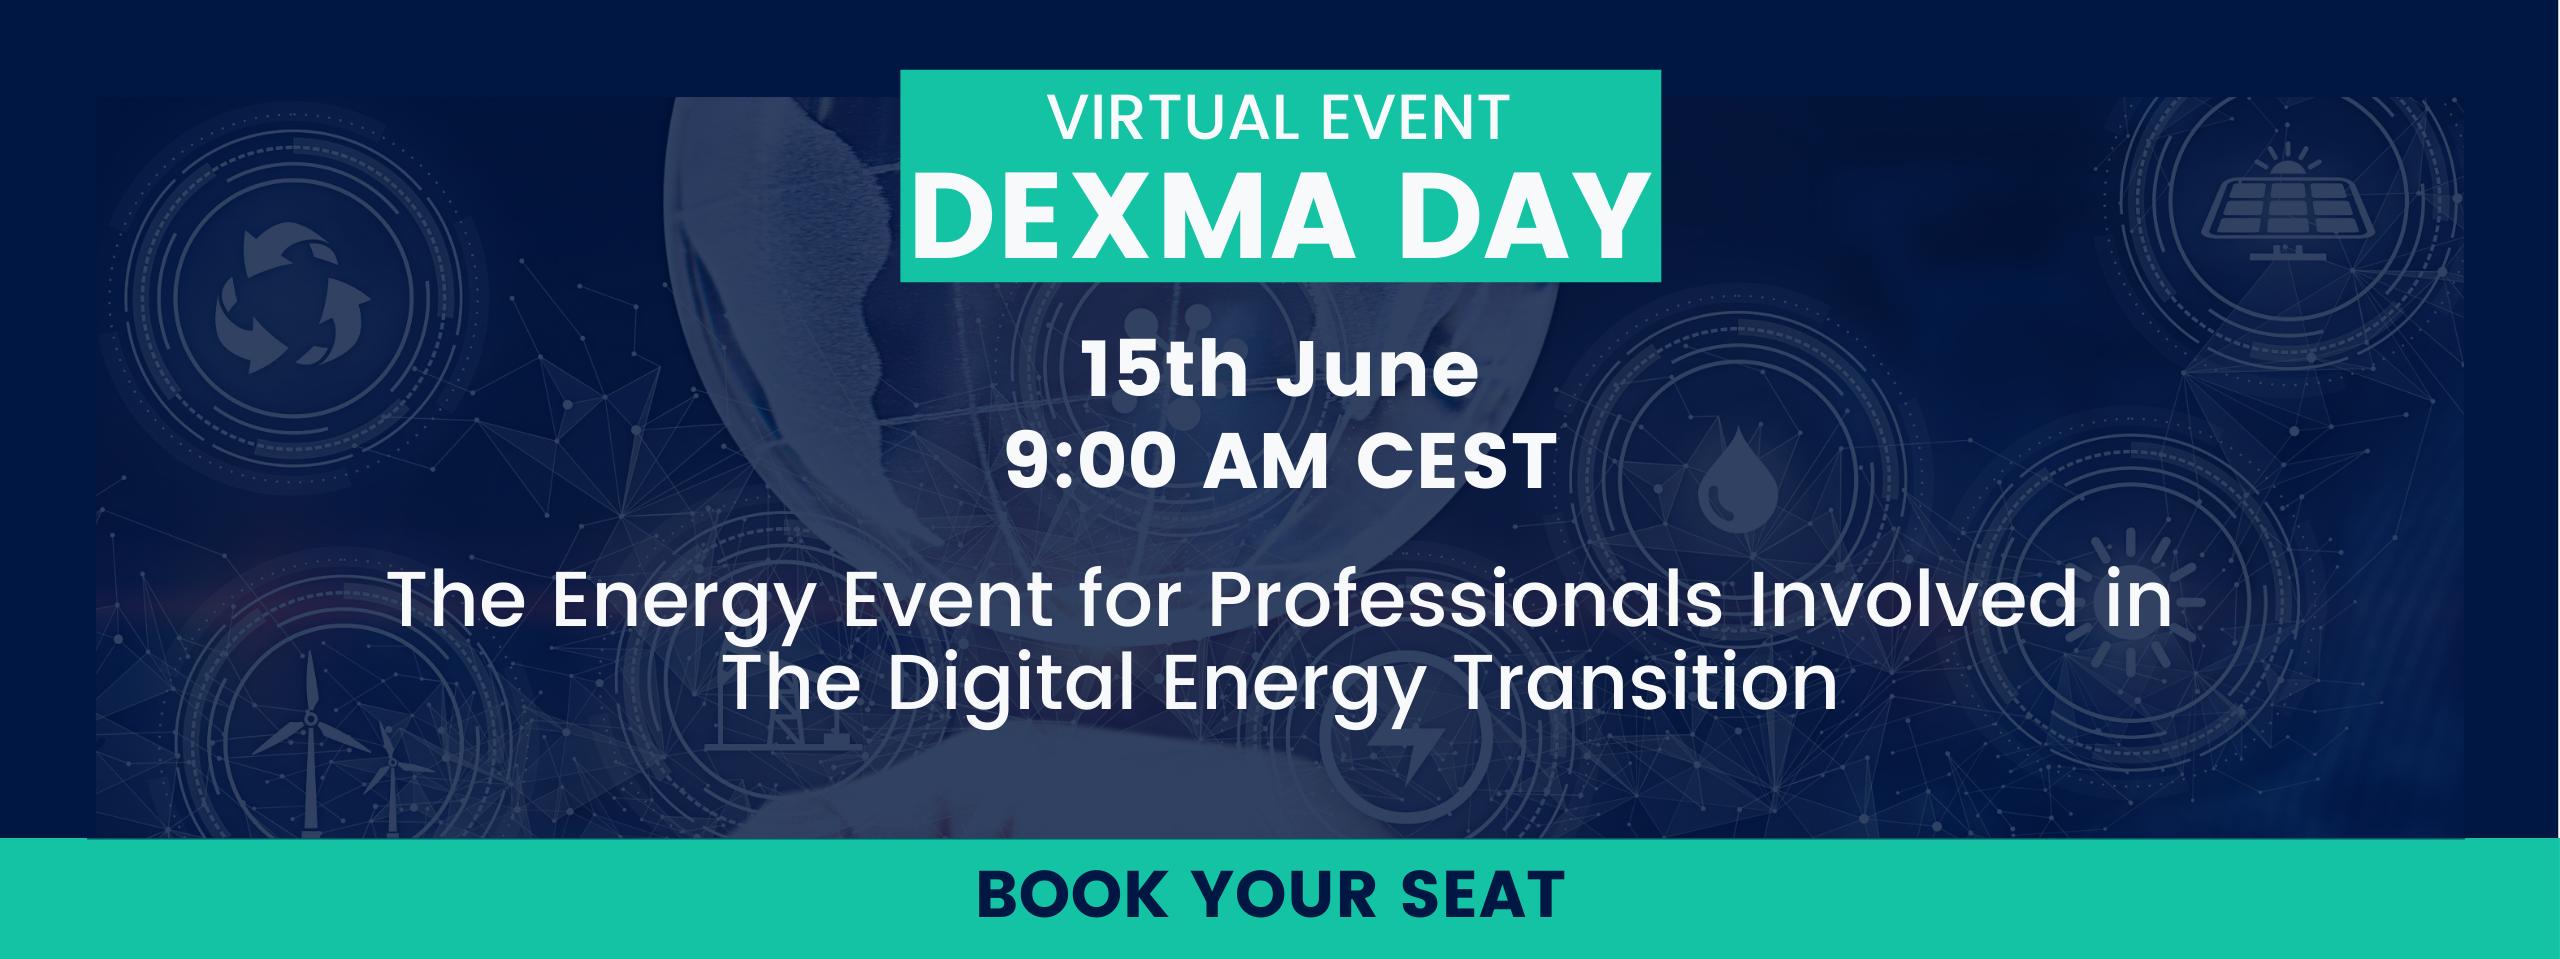 DEXMA Day 2021 Energy Efficiency Event